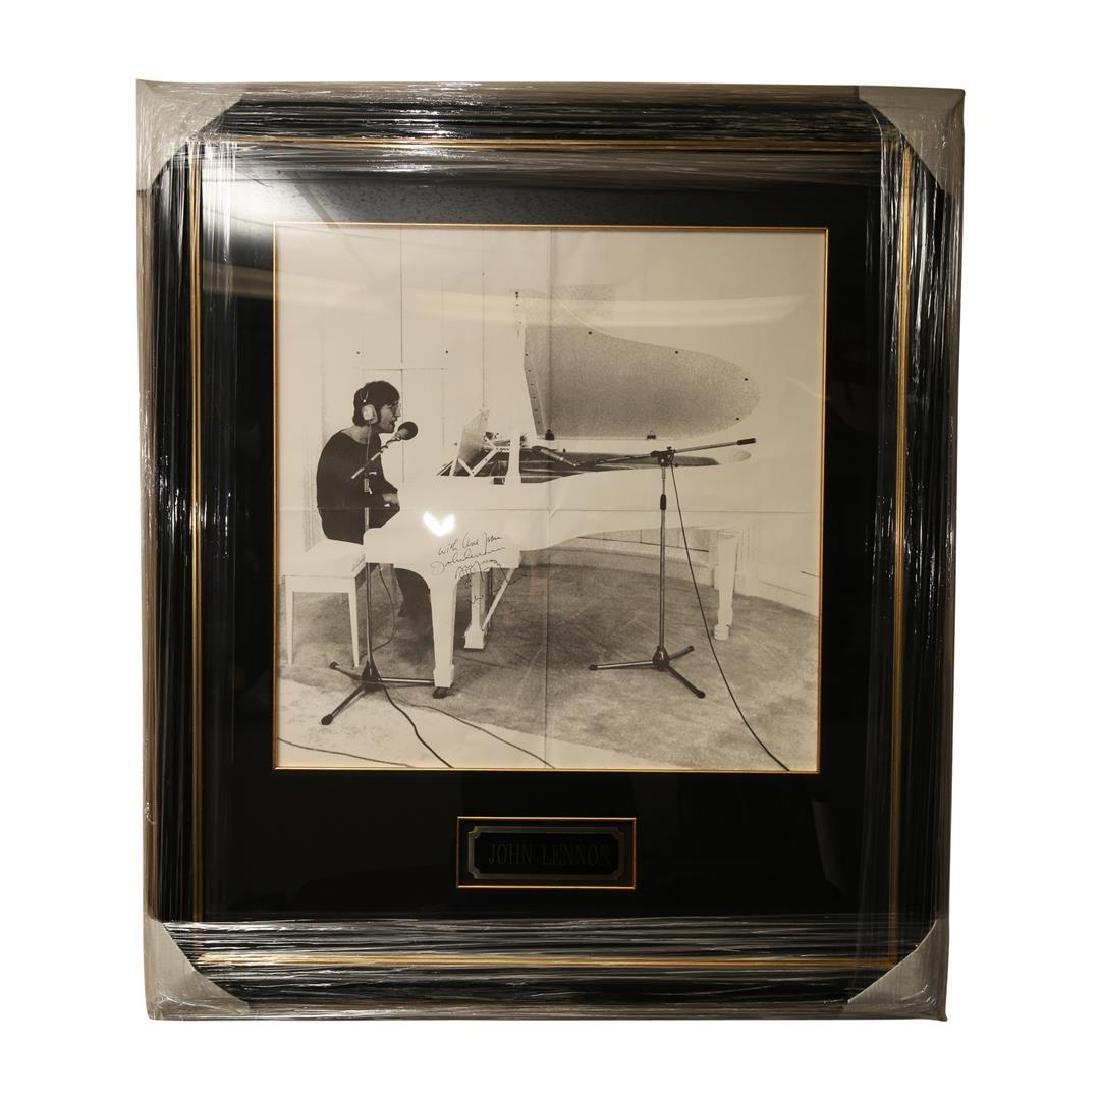 John Lennon Autographed Poster